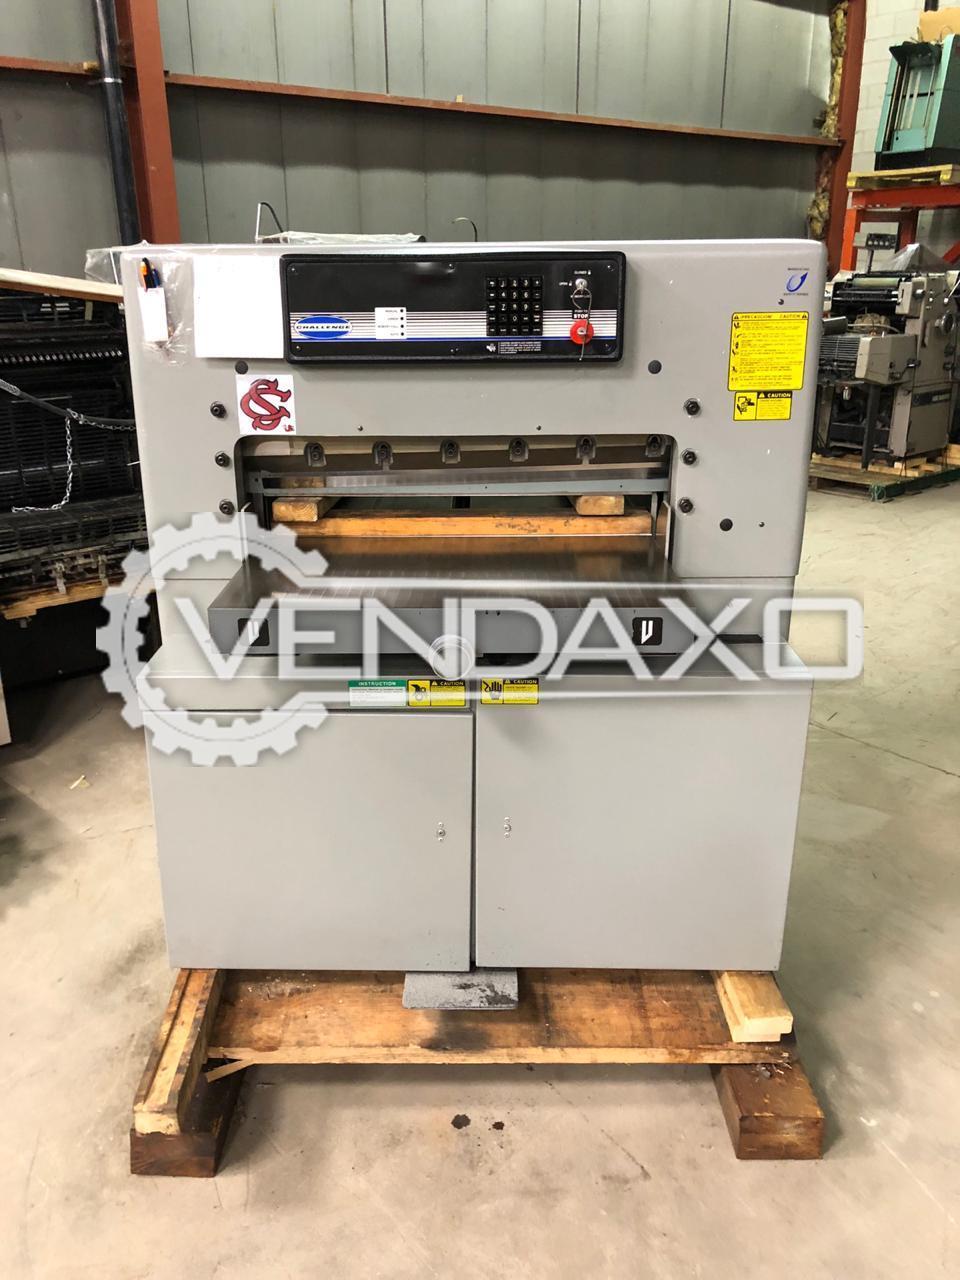 2 Set Of Challenge 305 Paper Cutting Machine - Size - 30.5 Inch